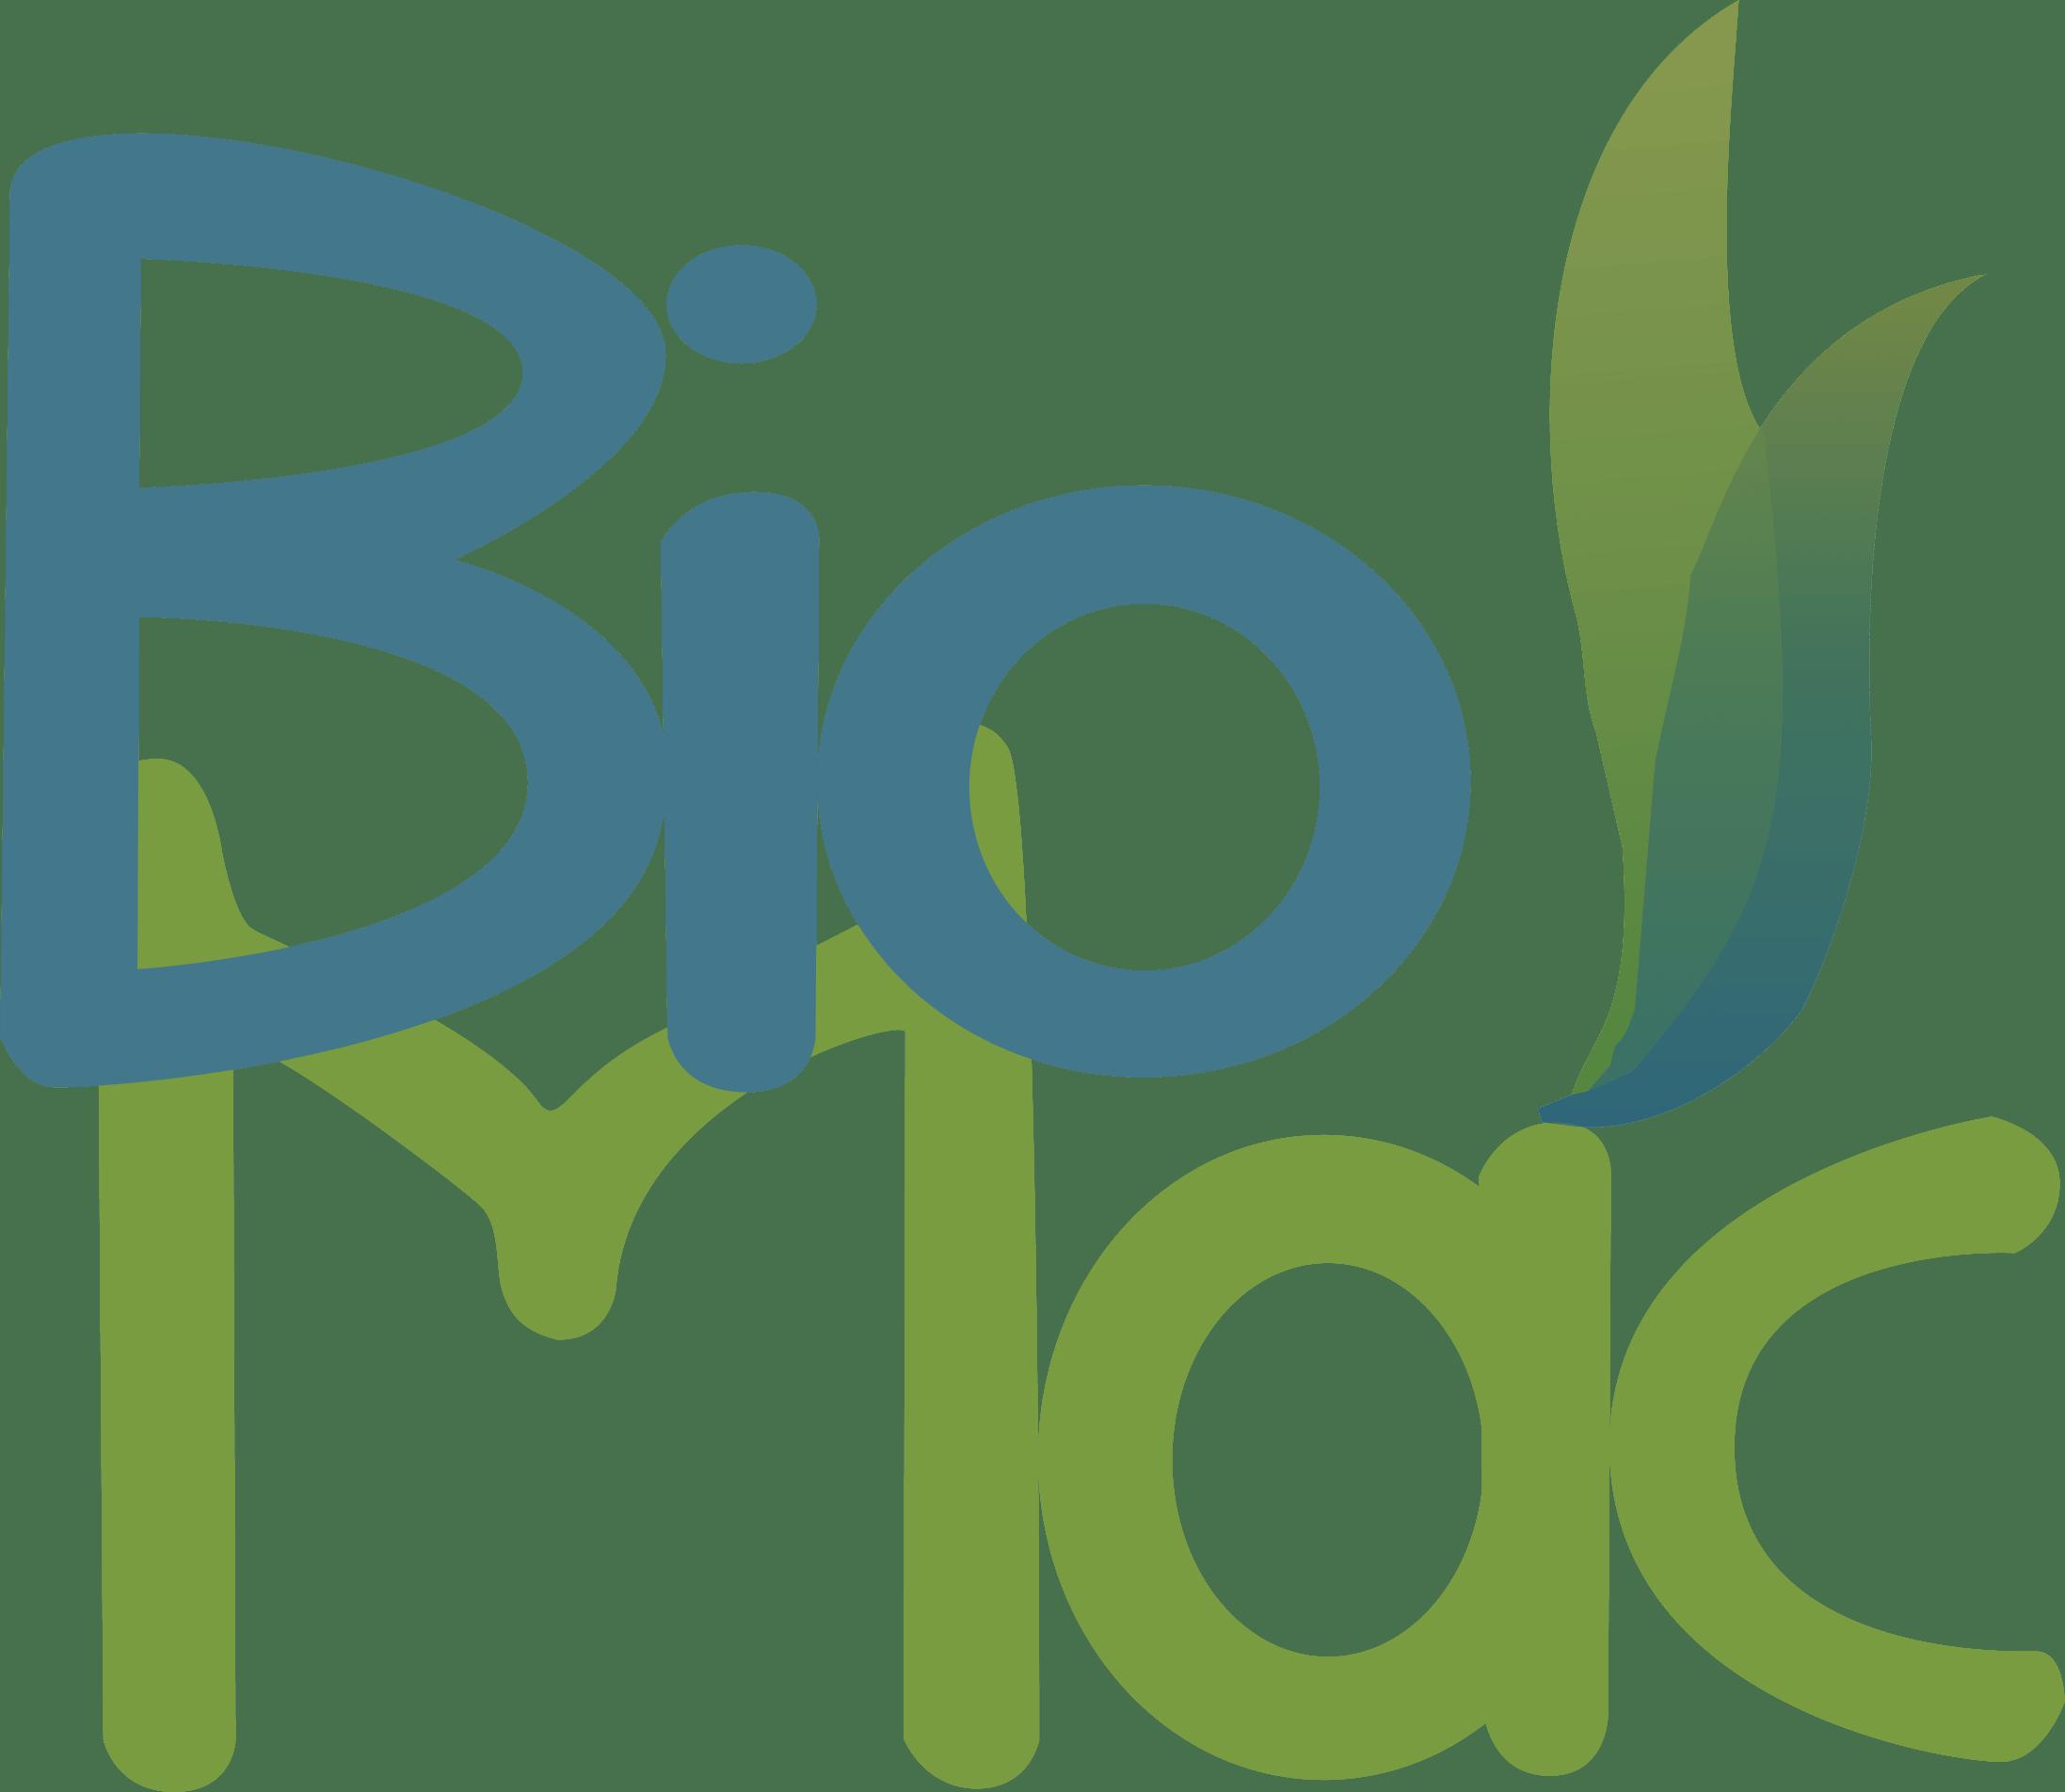 Logo BioMac